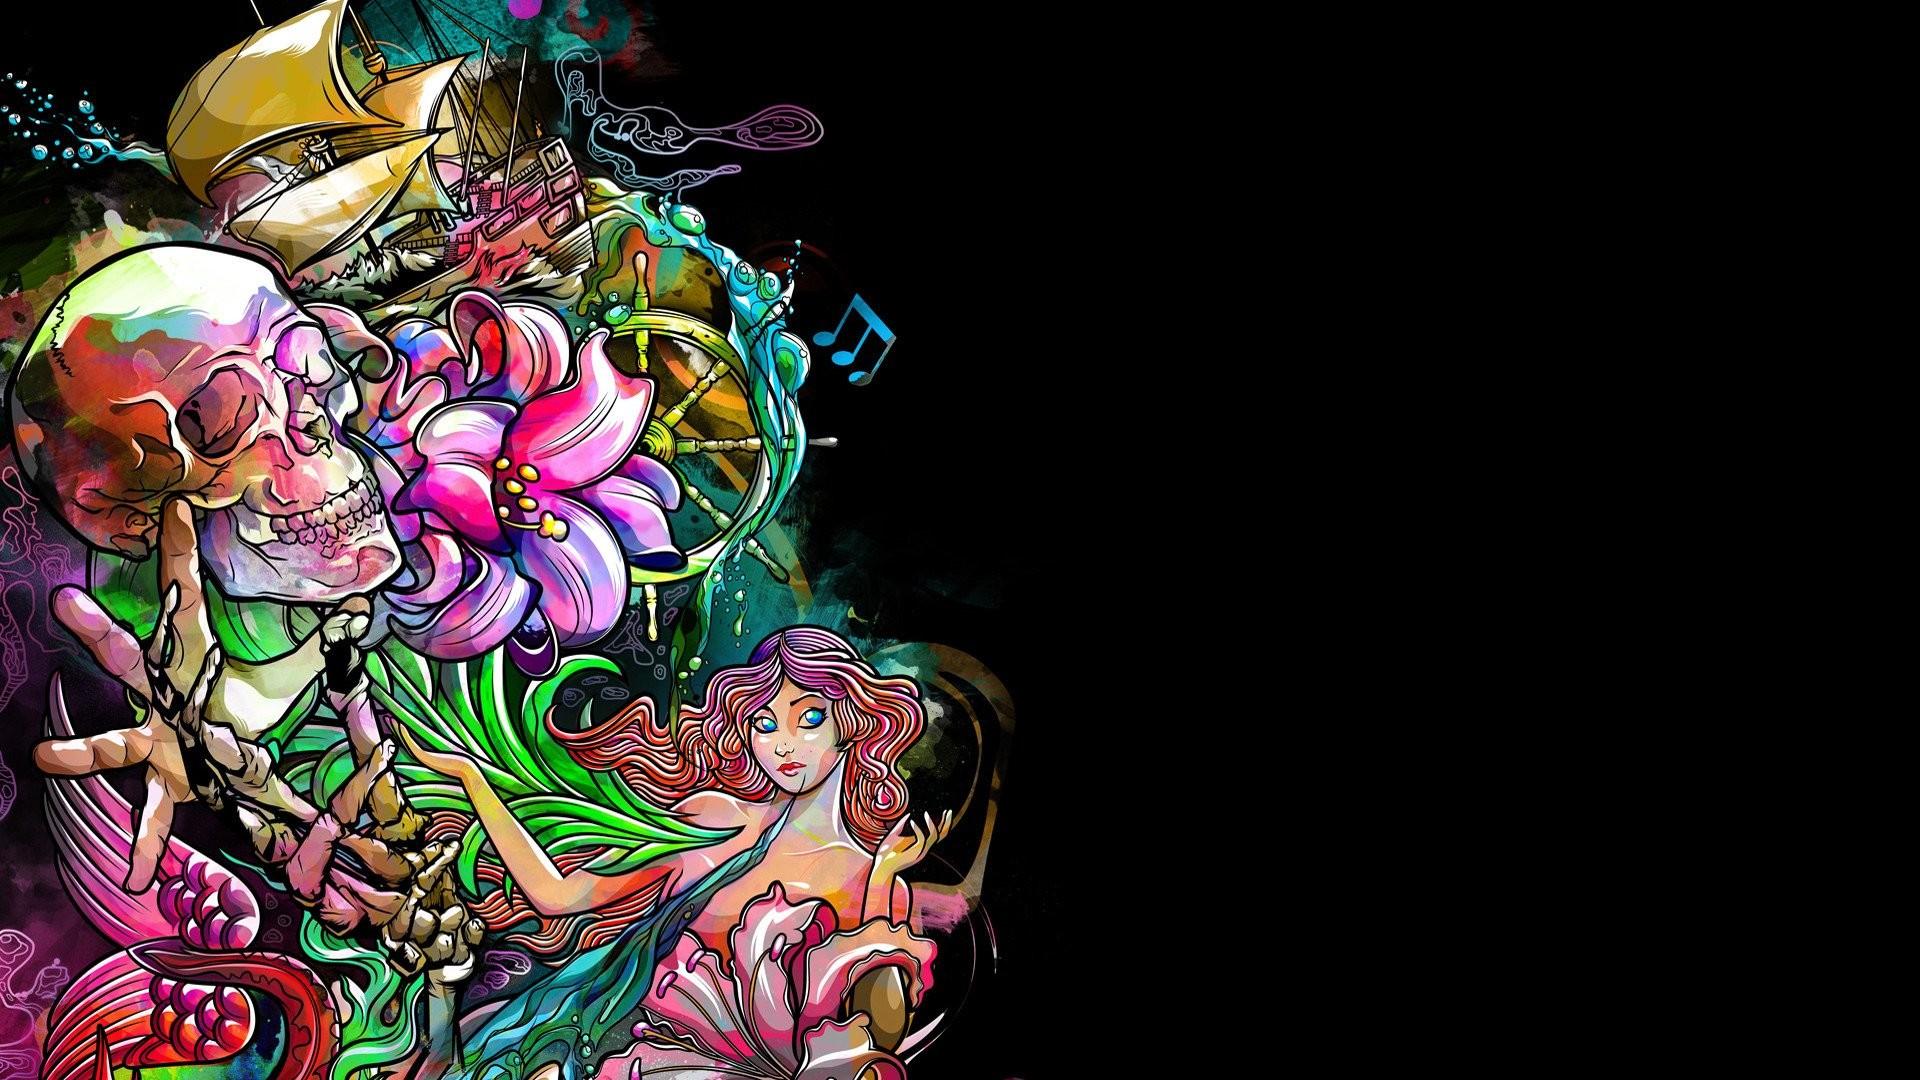 https://ja.best-wallpaper.net/wallpaper/1920×1080/1206/Mermaid-in-Pirates-of-the-Caribbean-HD_1920x1080.jpg    1920 x 1080 Wallpapers   Pinterest   Wallpaper